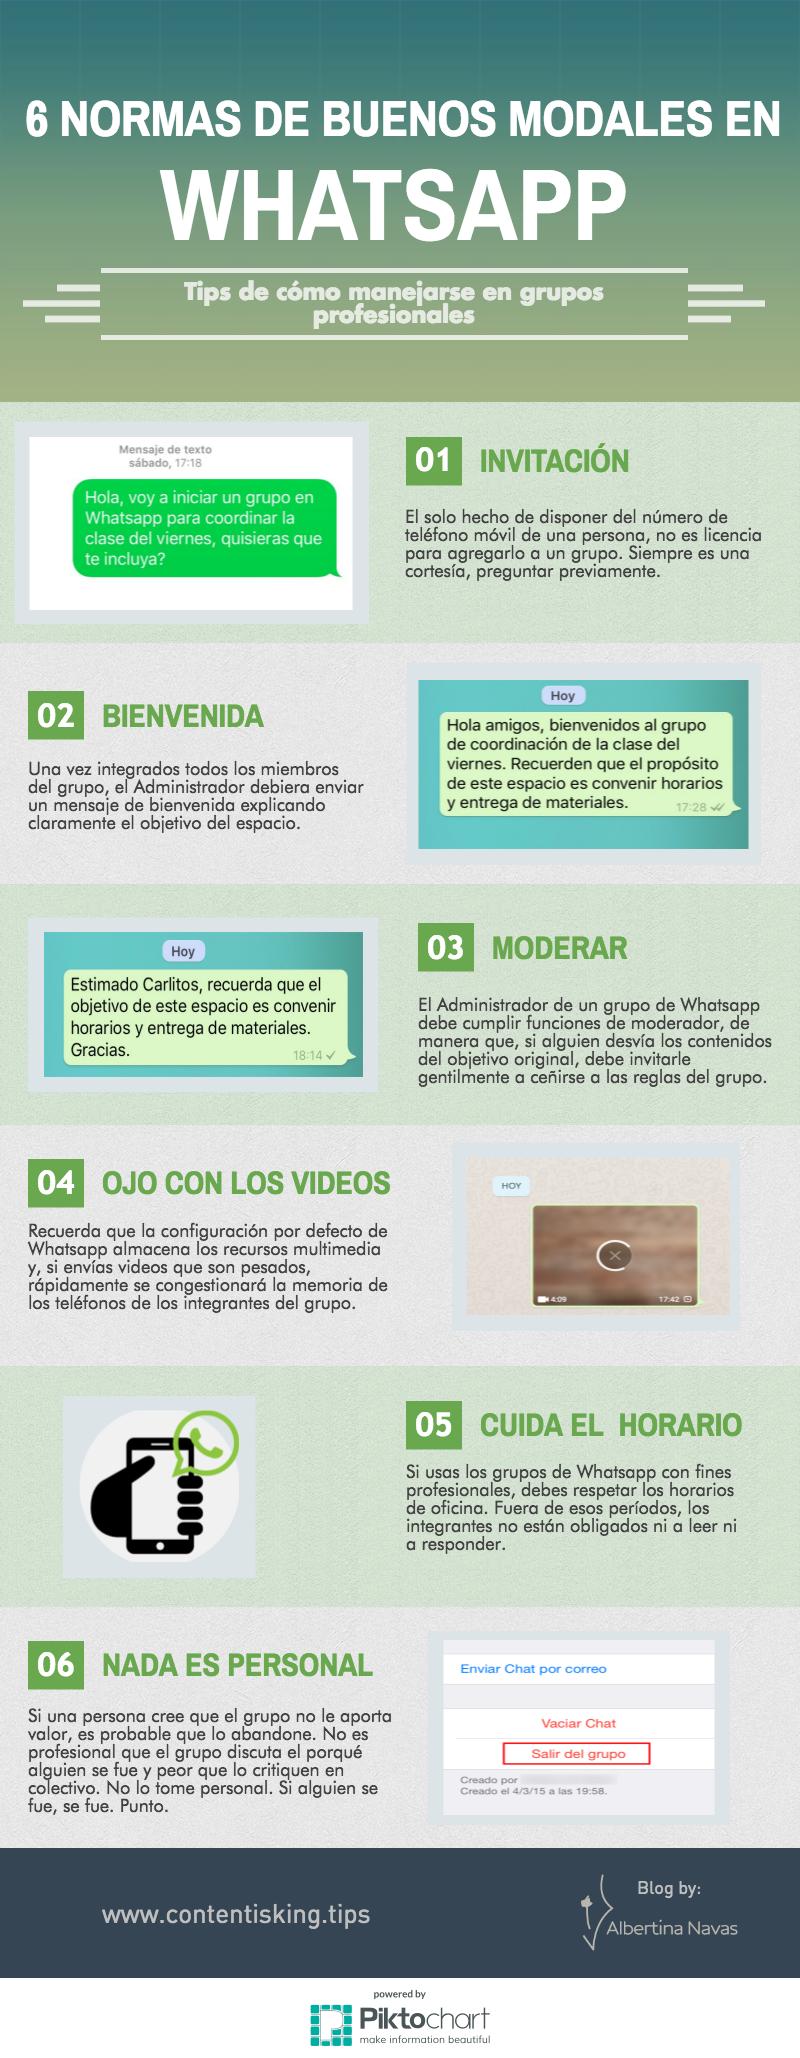 albertina navas, Whatsapp, modales en Whatsapp, social media, redes sociales, redes sociales Guatemala, redes sociales Centroamérica